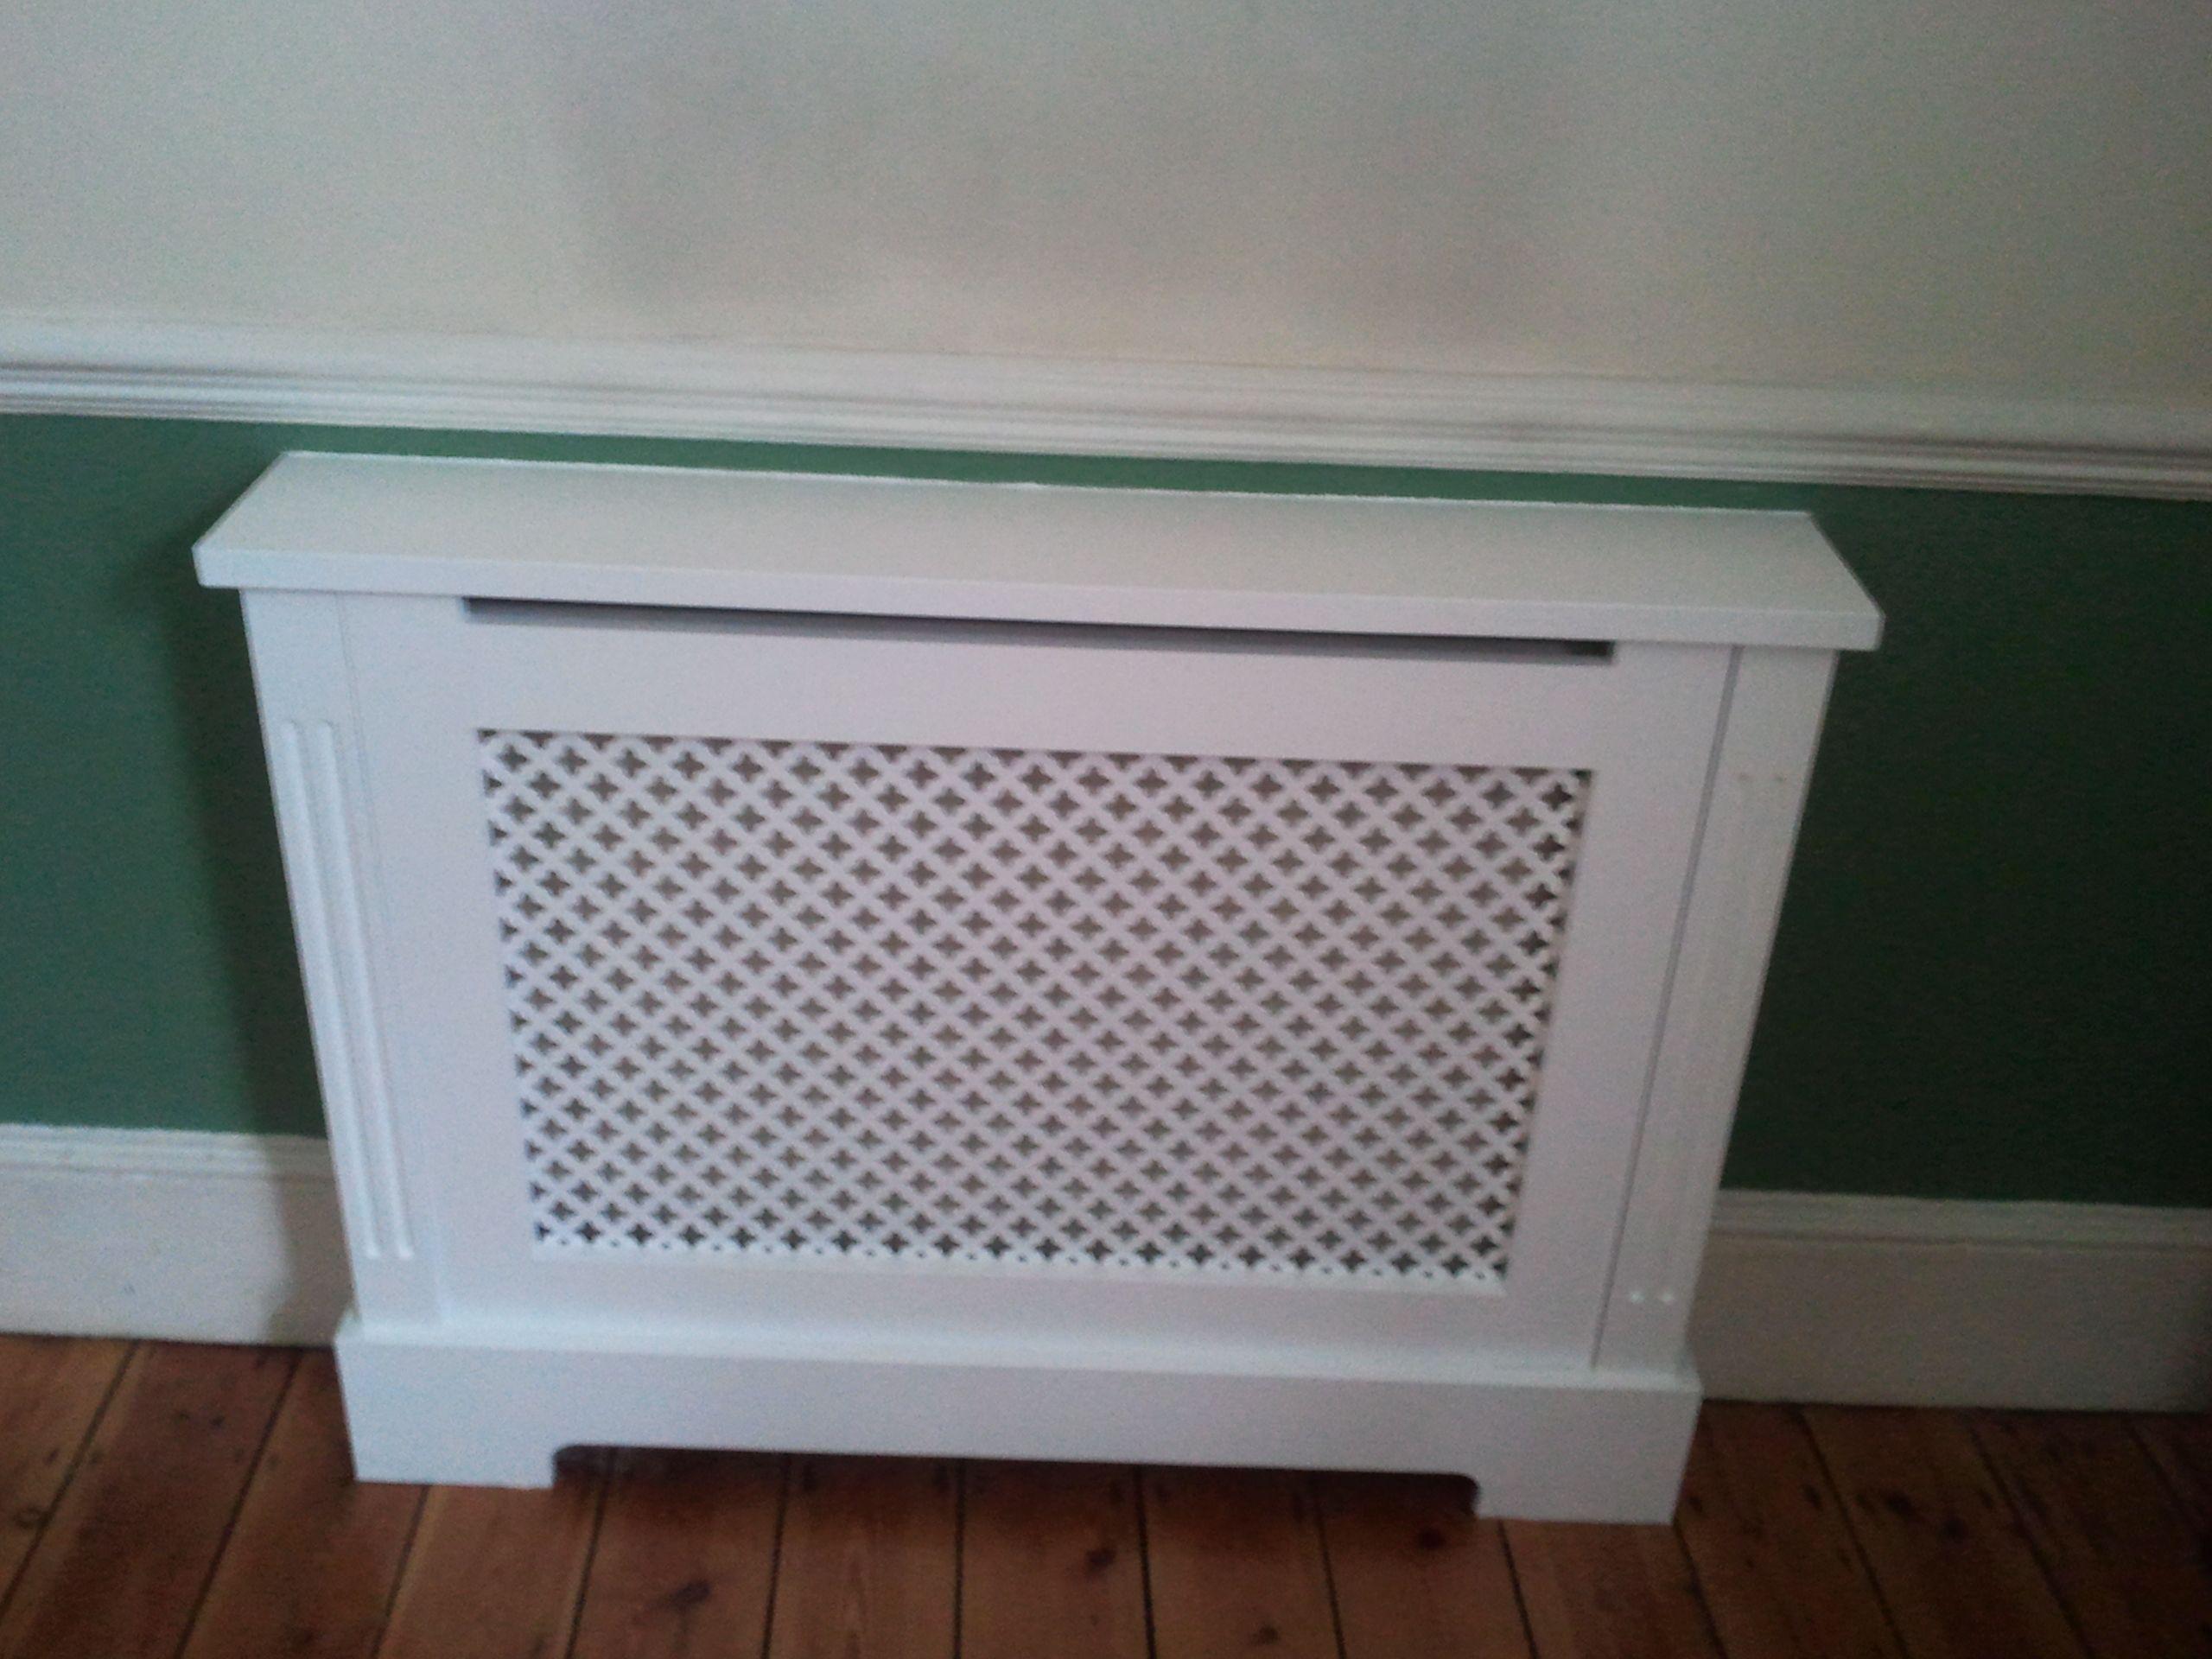 Bespoke radiator covers Radiator cover